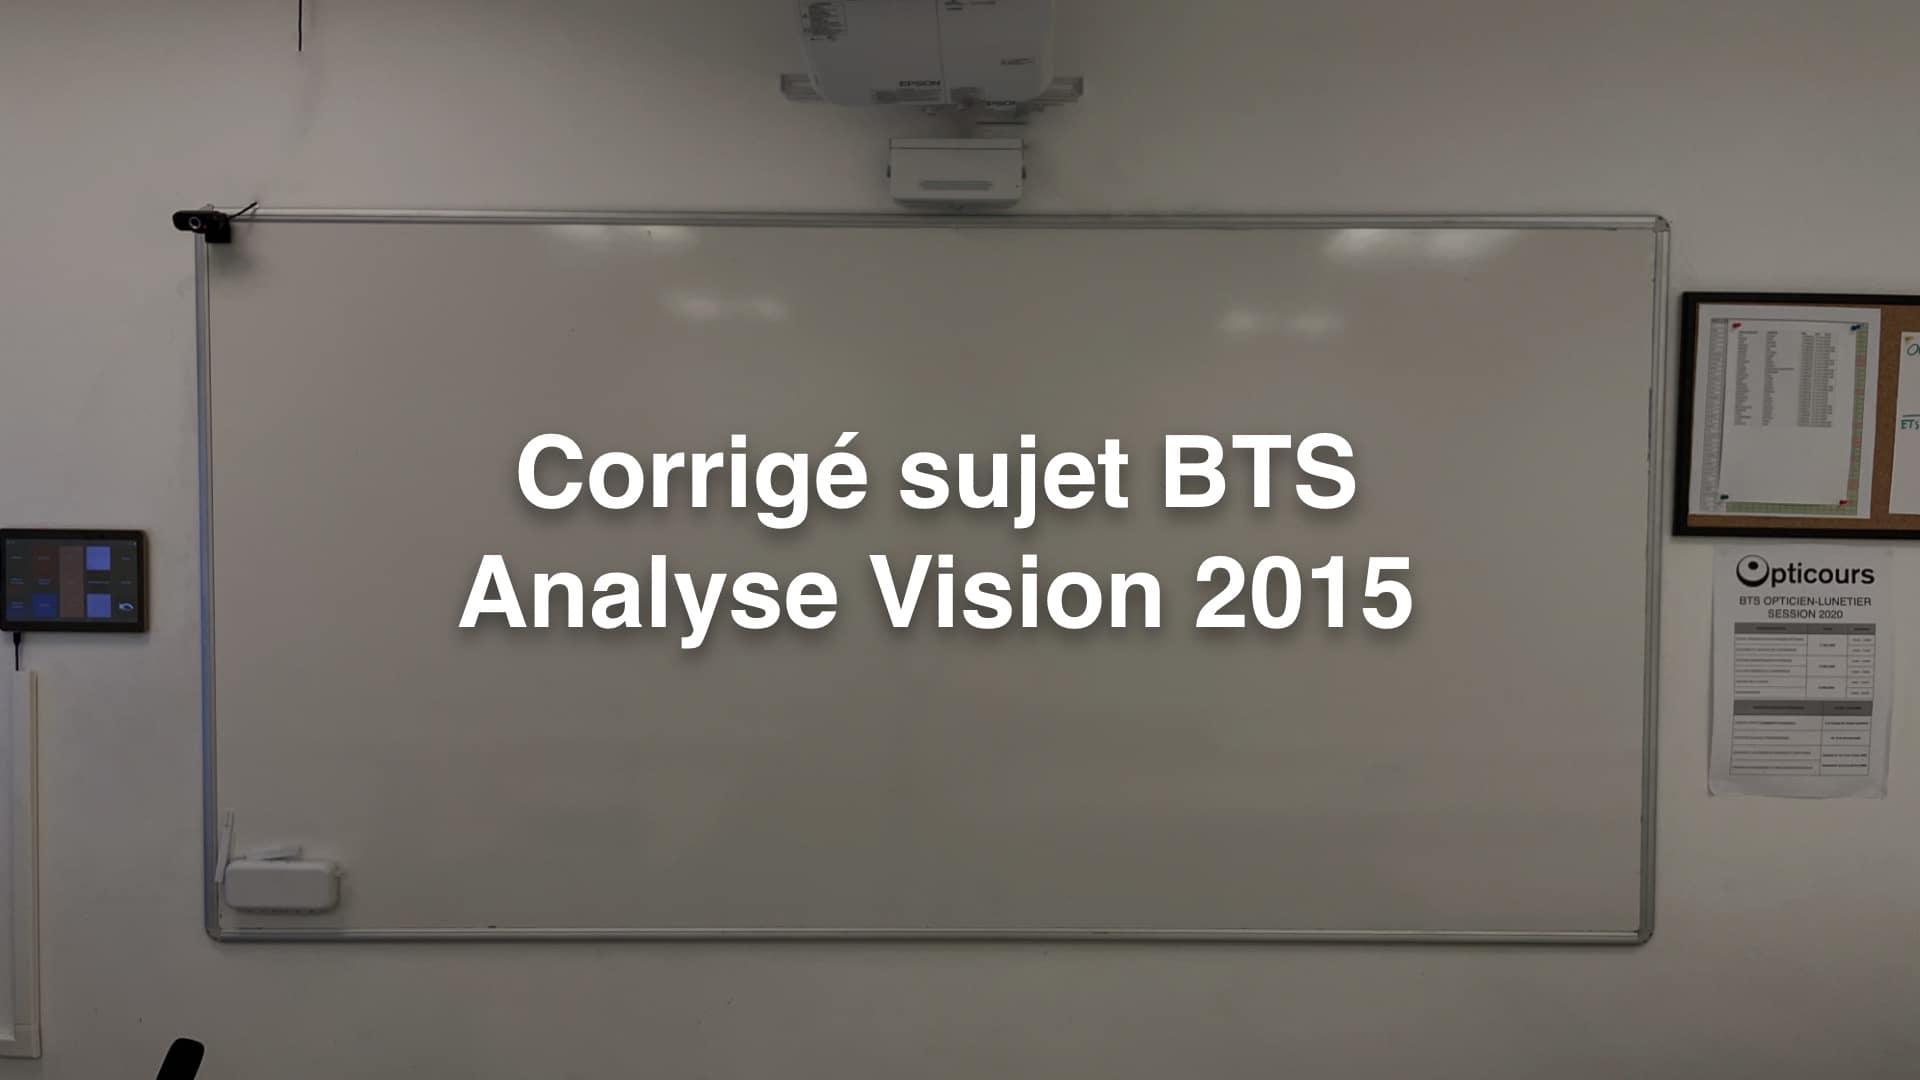 Corrigé sujet BTS Analyse Vision 2015